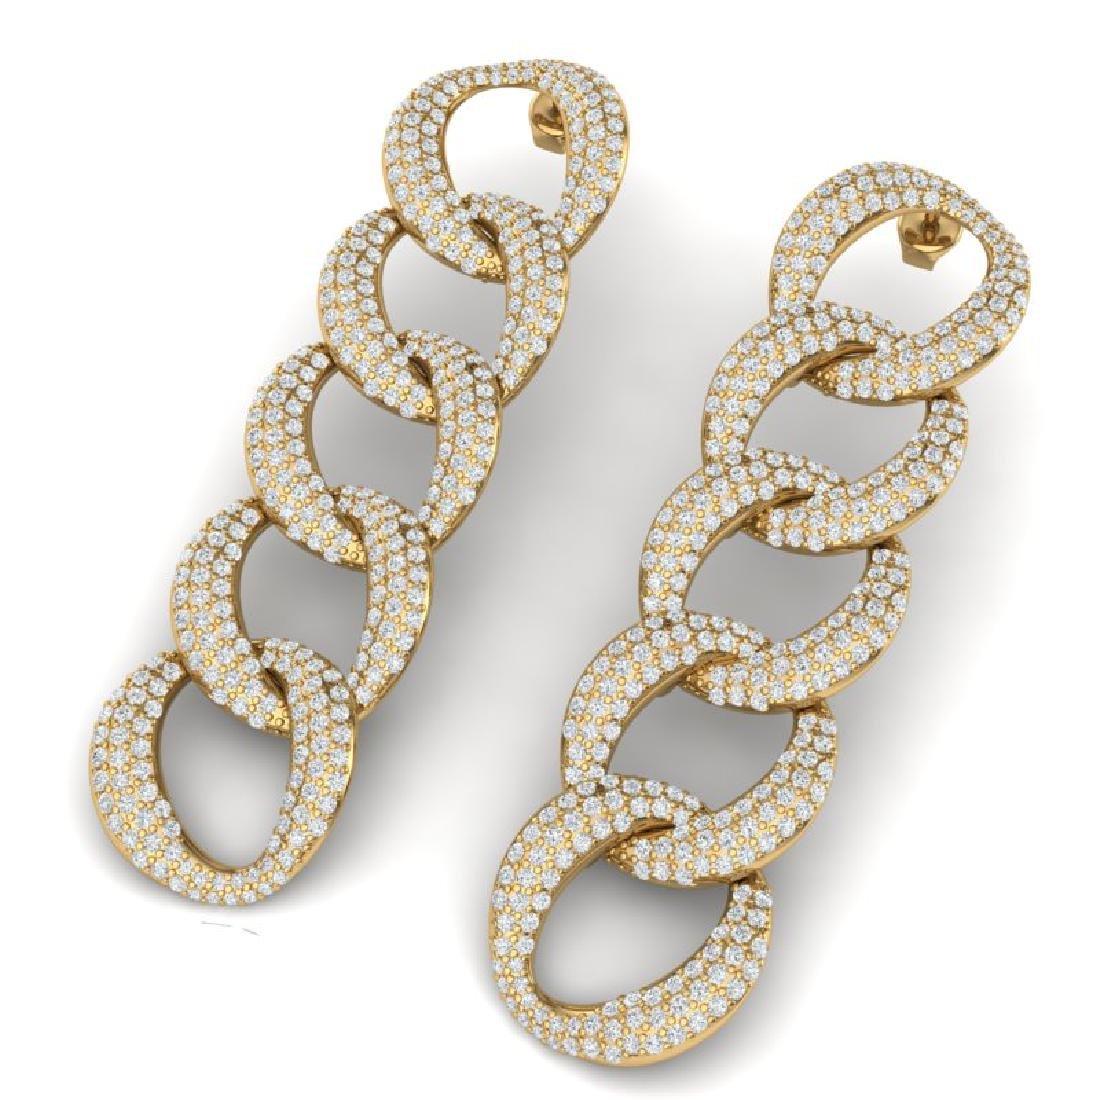 5 CTW Certified VS/SI Diamond Earrings 18K Yellow Gold